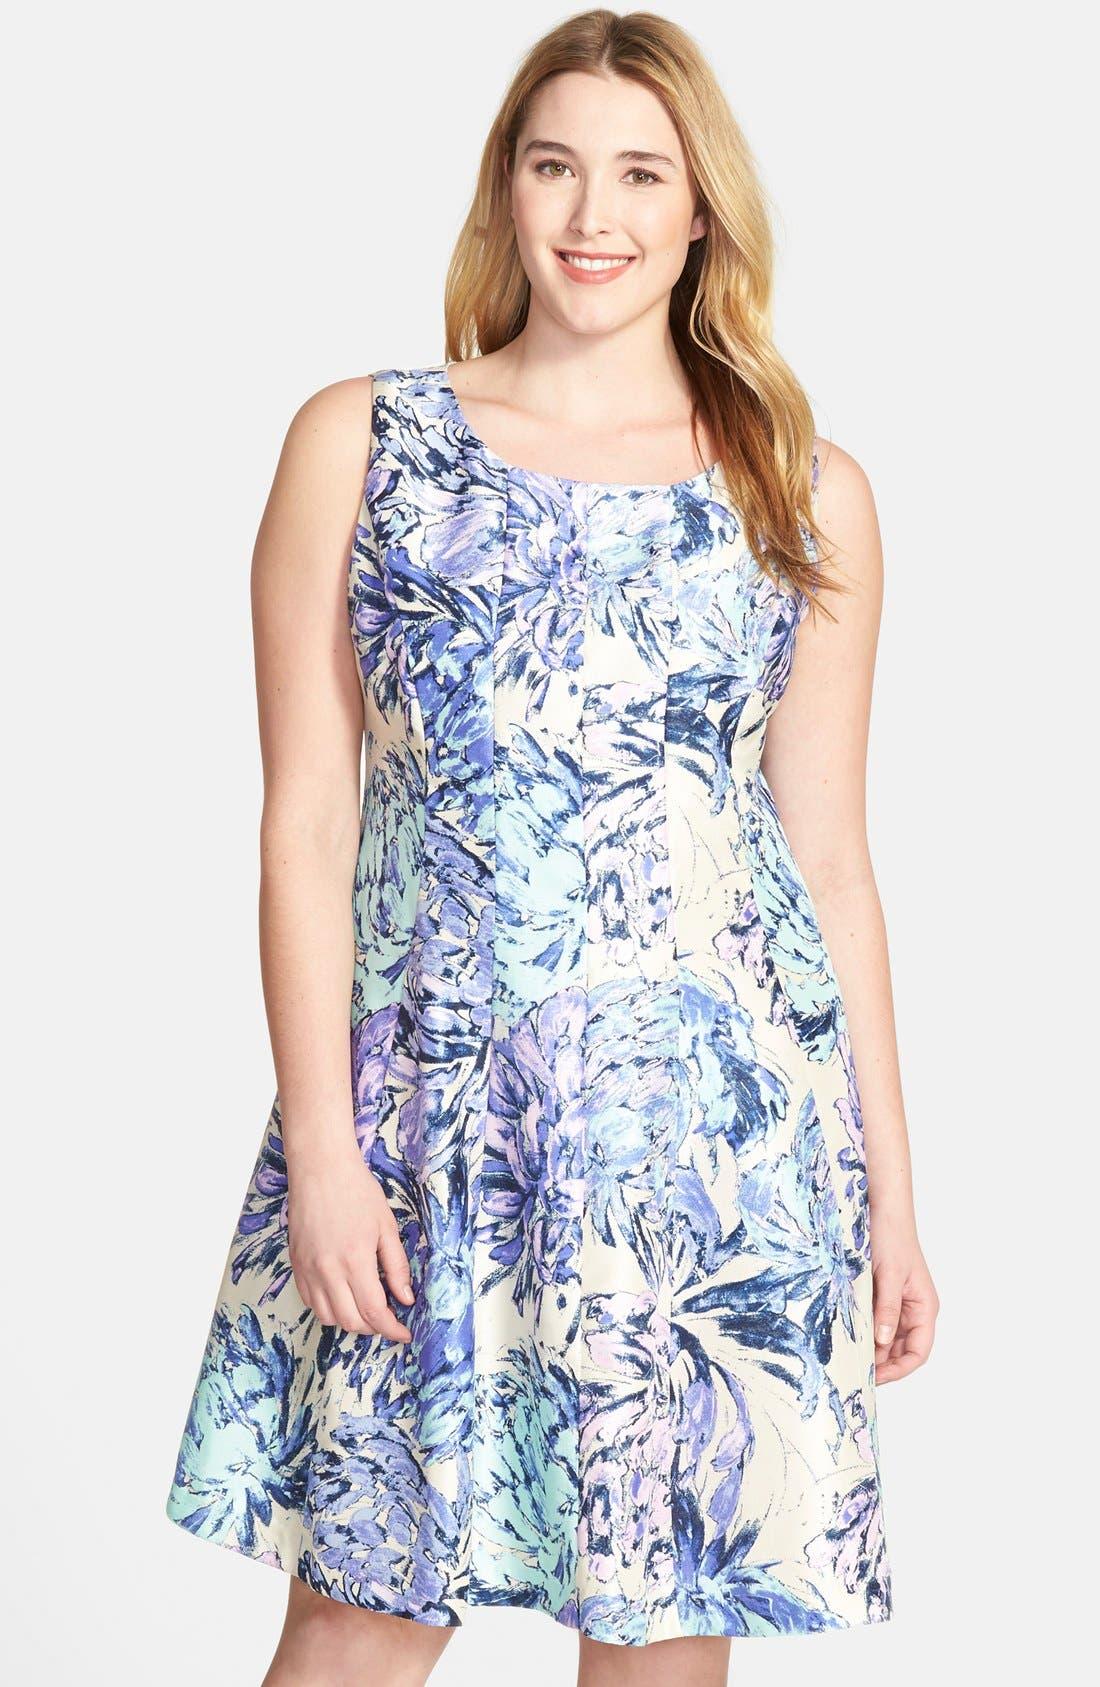 Alternate Image 1 Selected - Taylor Dresses Floral Shantung Fit & Flare Dress (Plus Size)